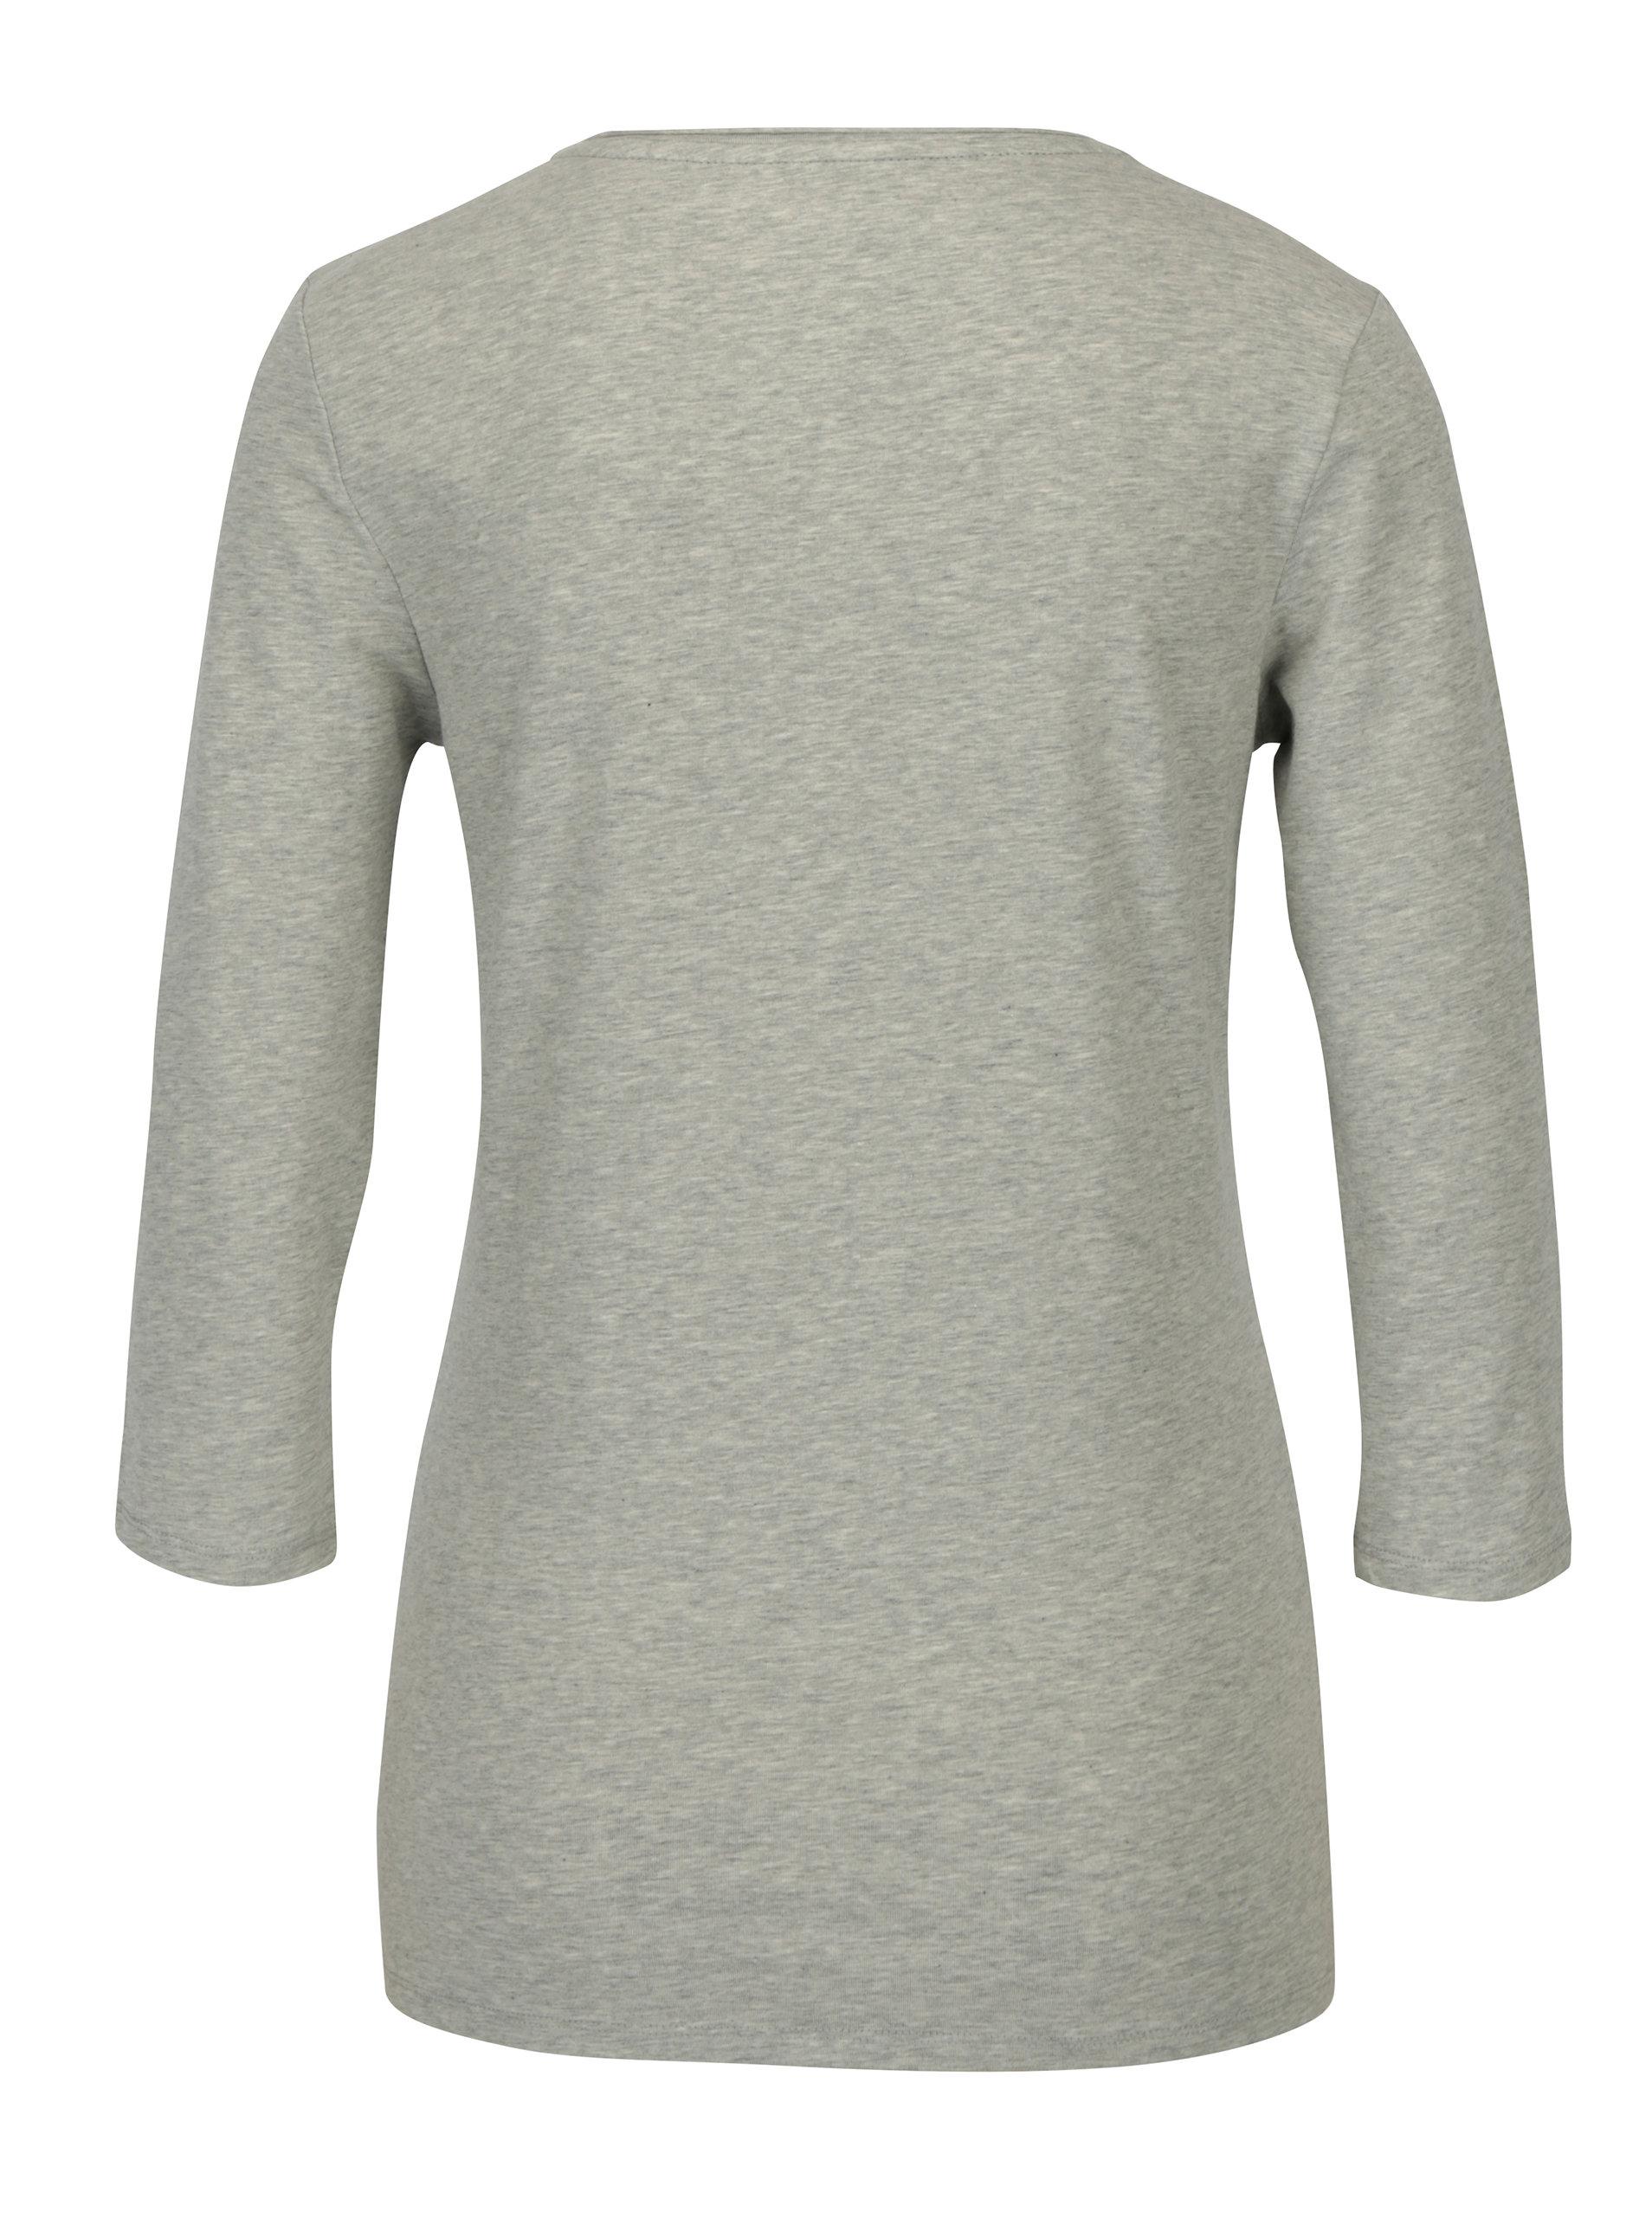 78b329b75 Sivé dámske tričko s 3/4 rukávom Tommy Hilfiger Lizzy | ZOOT.sk